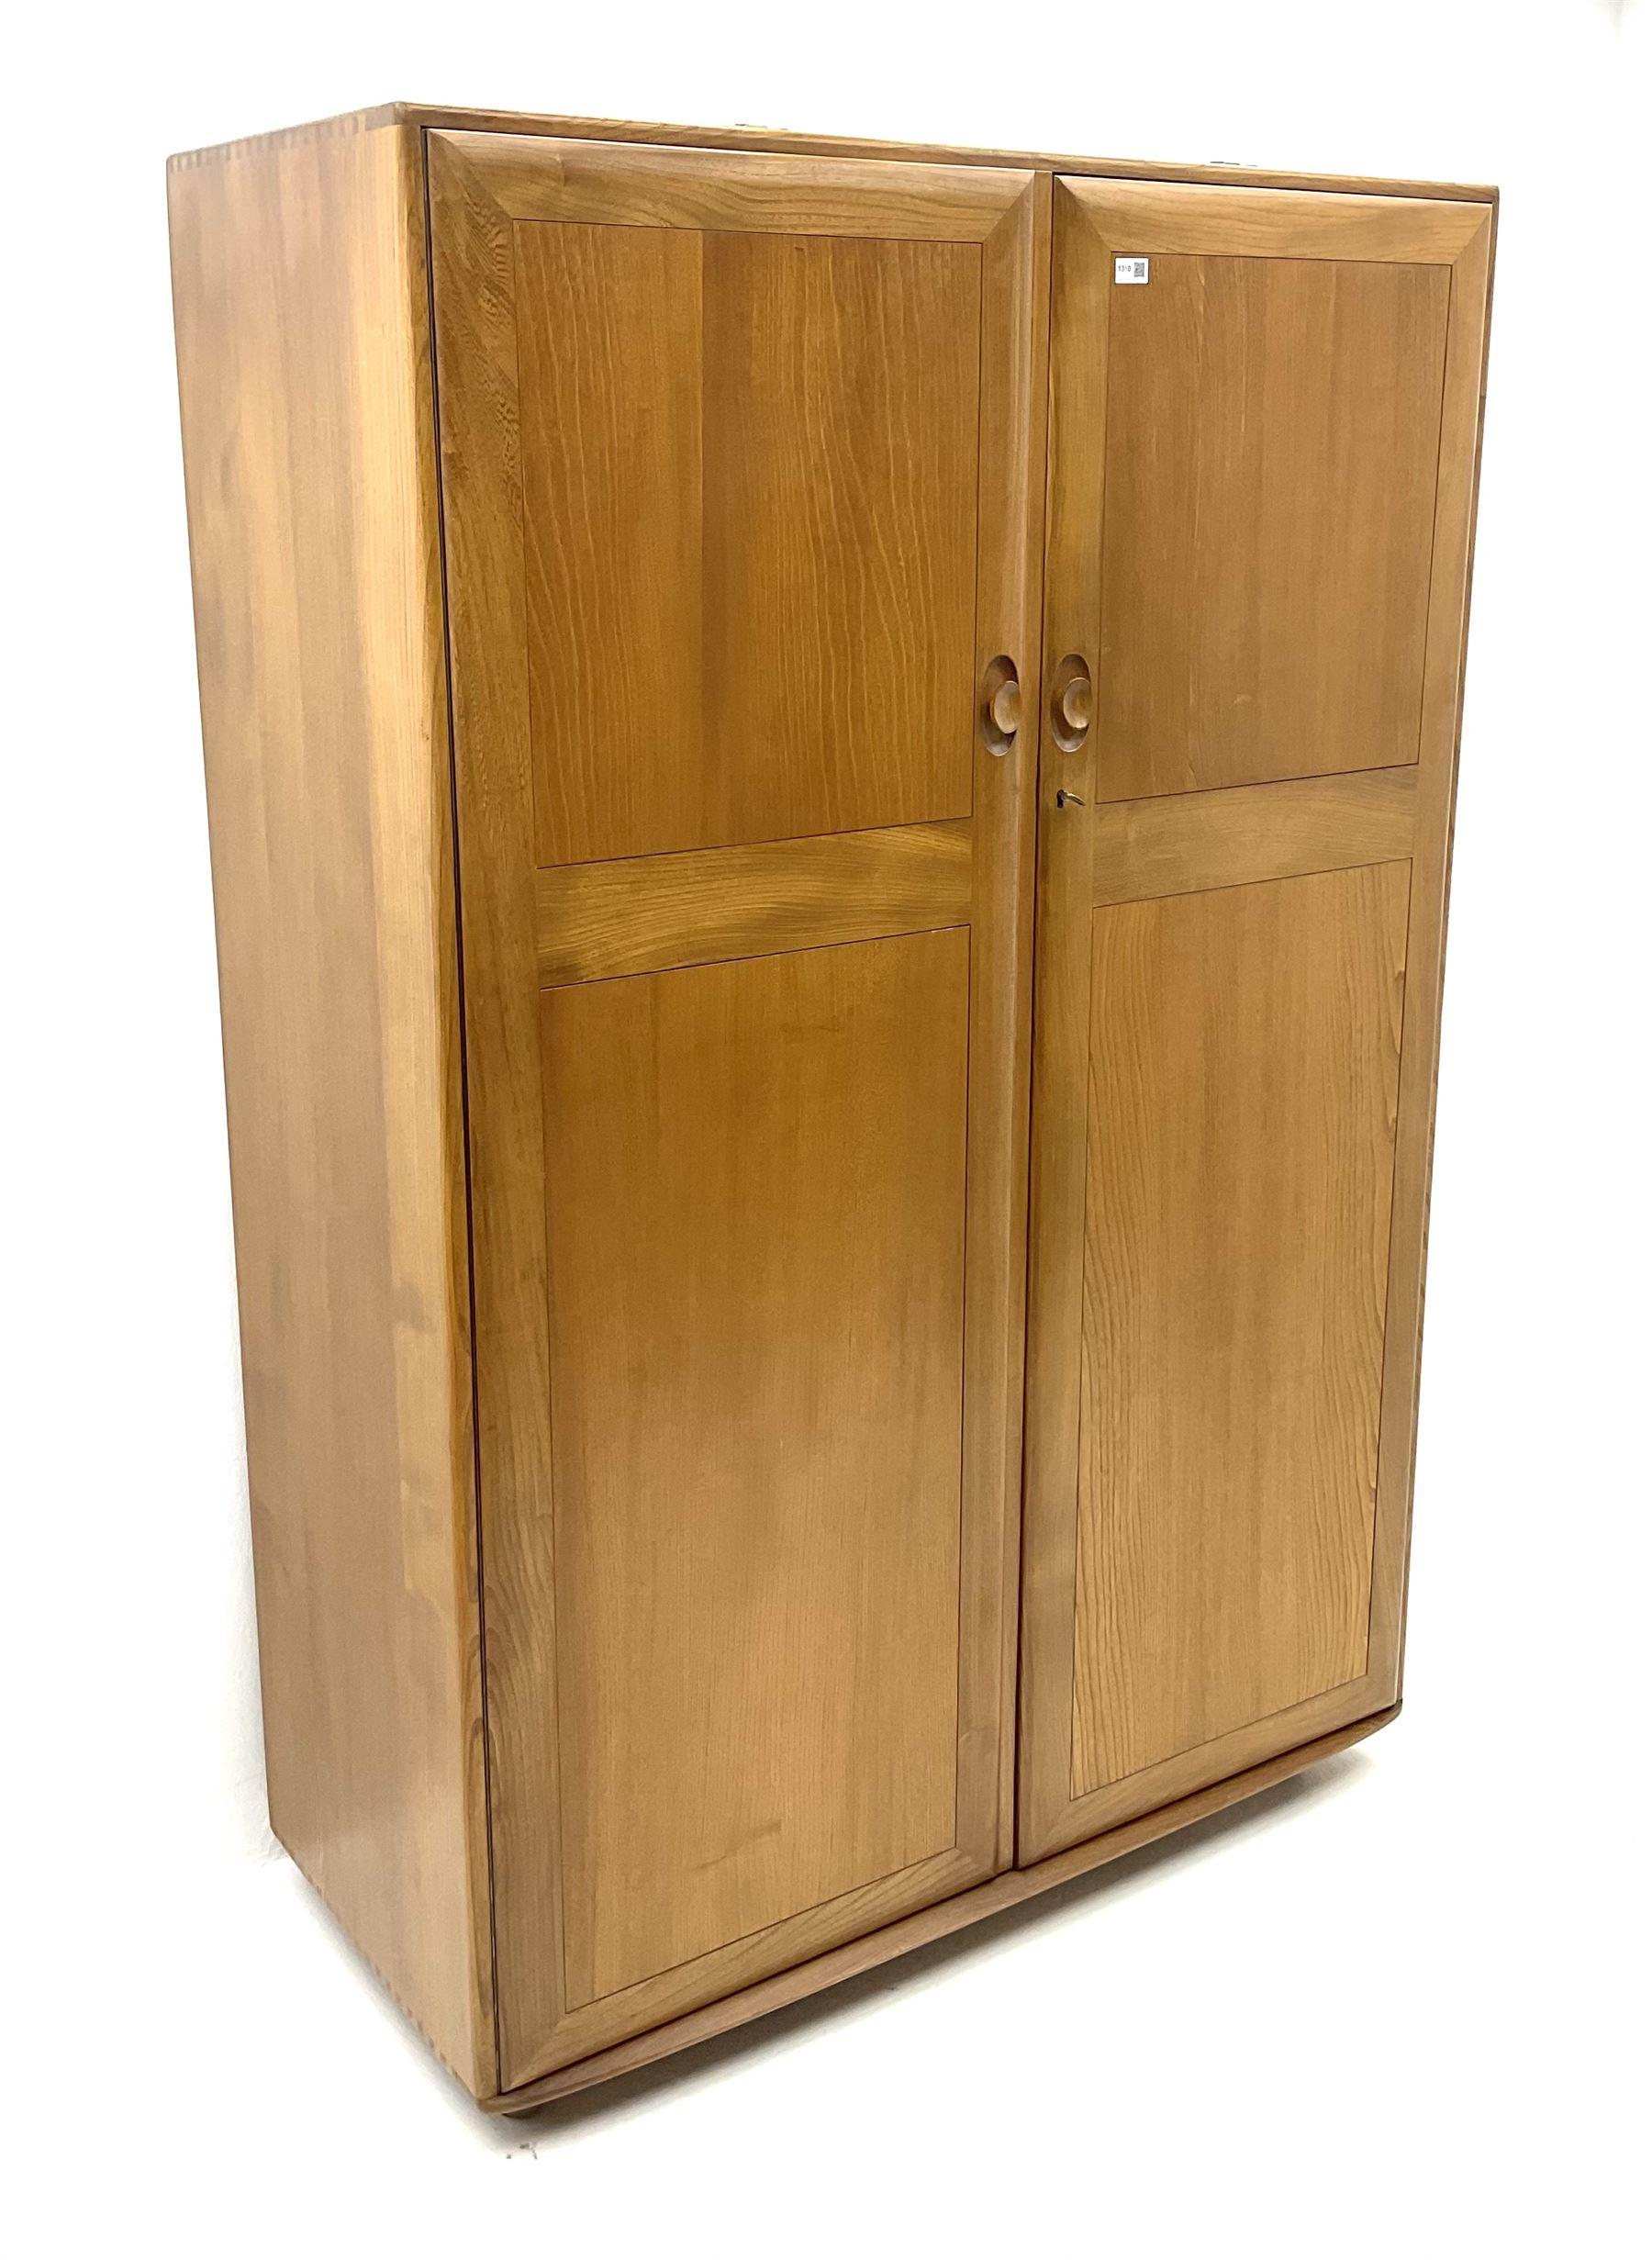 Ercol double wardrobe - Image 2 of 4